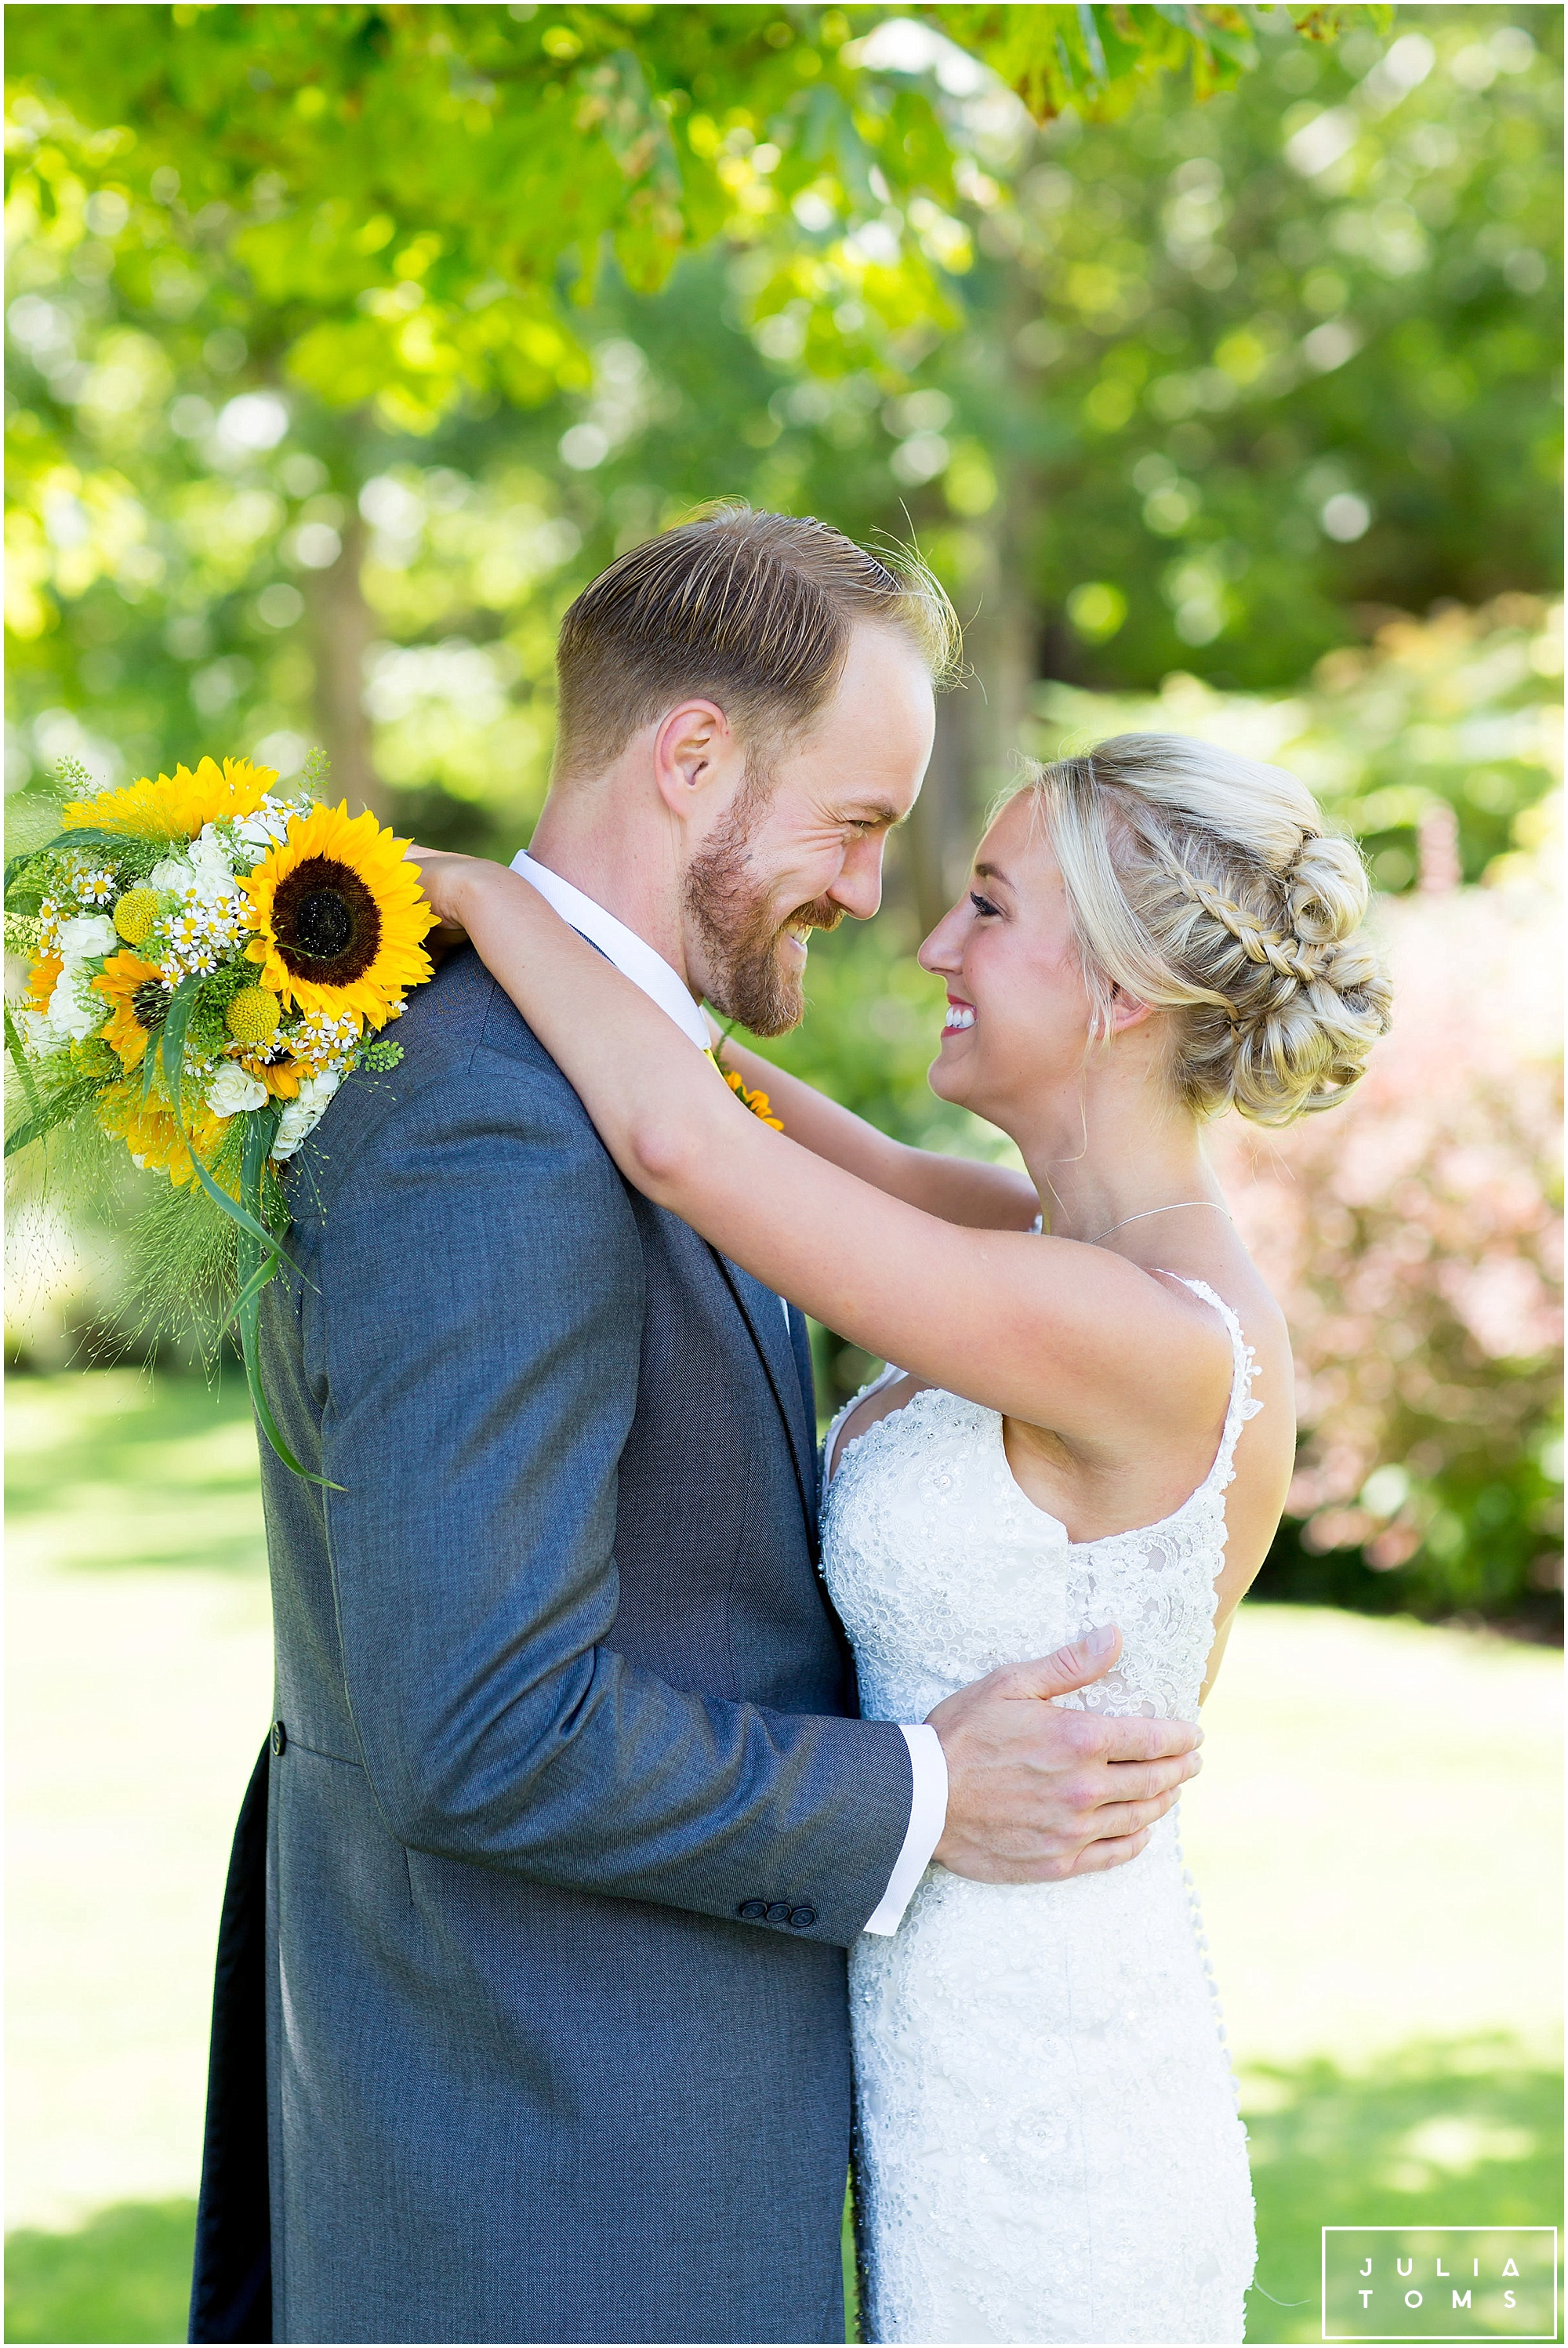 julia_toms_chichester_wedding_photographer_worthing_044.jpg